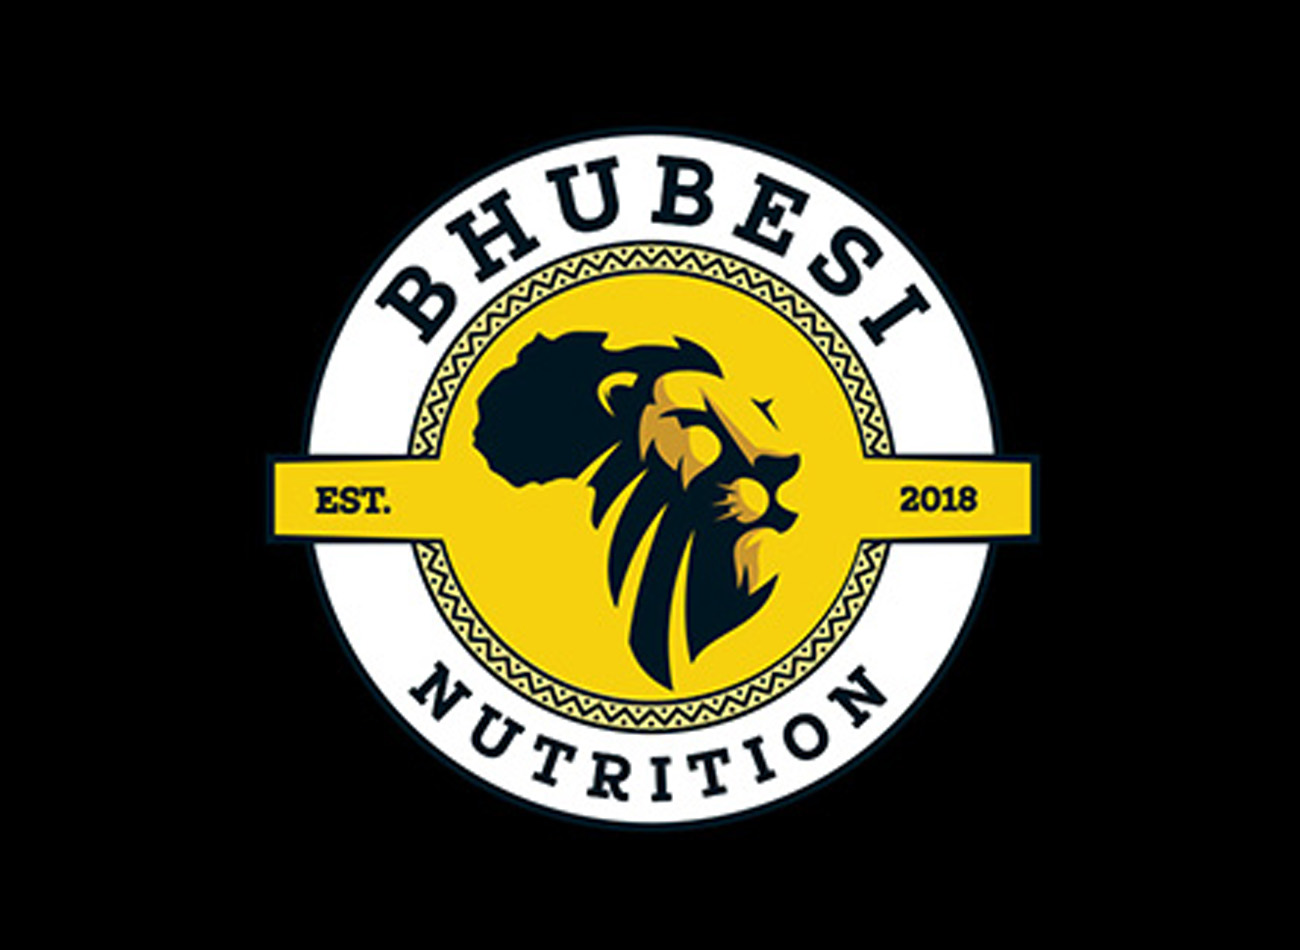 Bhubesi-Logo-Case-Study-Corporate-Identity-Agent-Orange-Design-Thumbnail.jpg